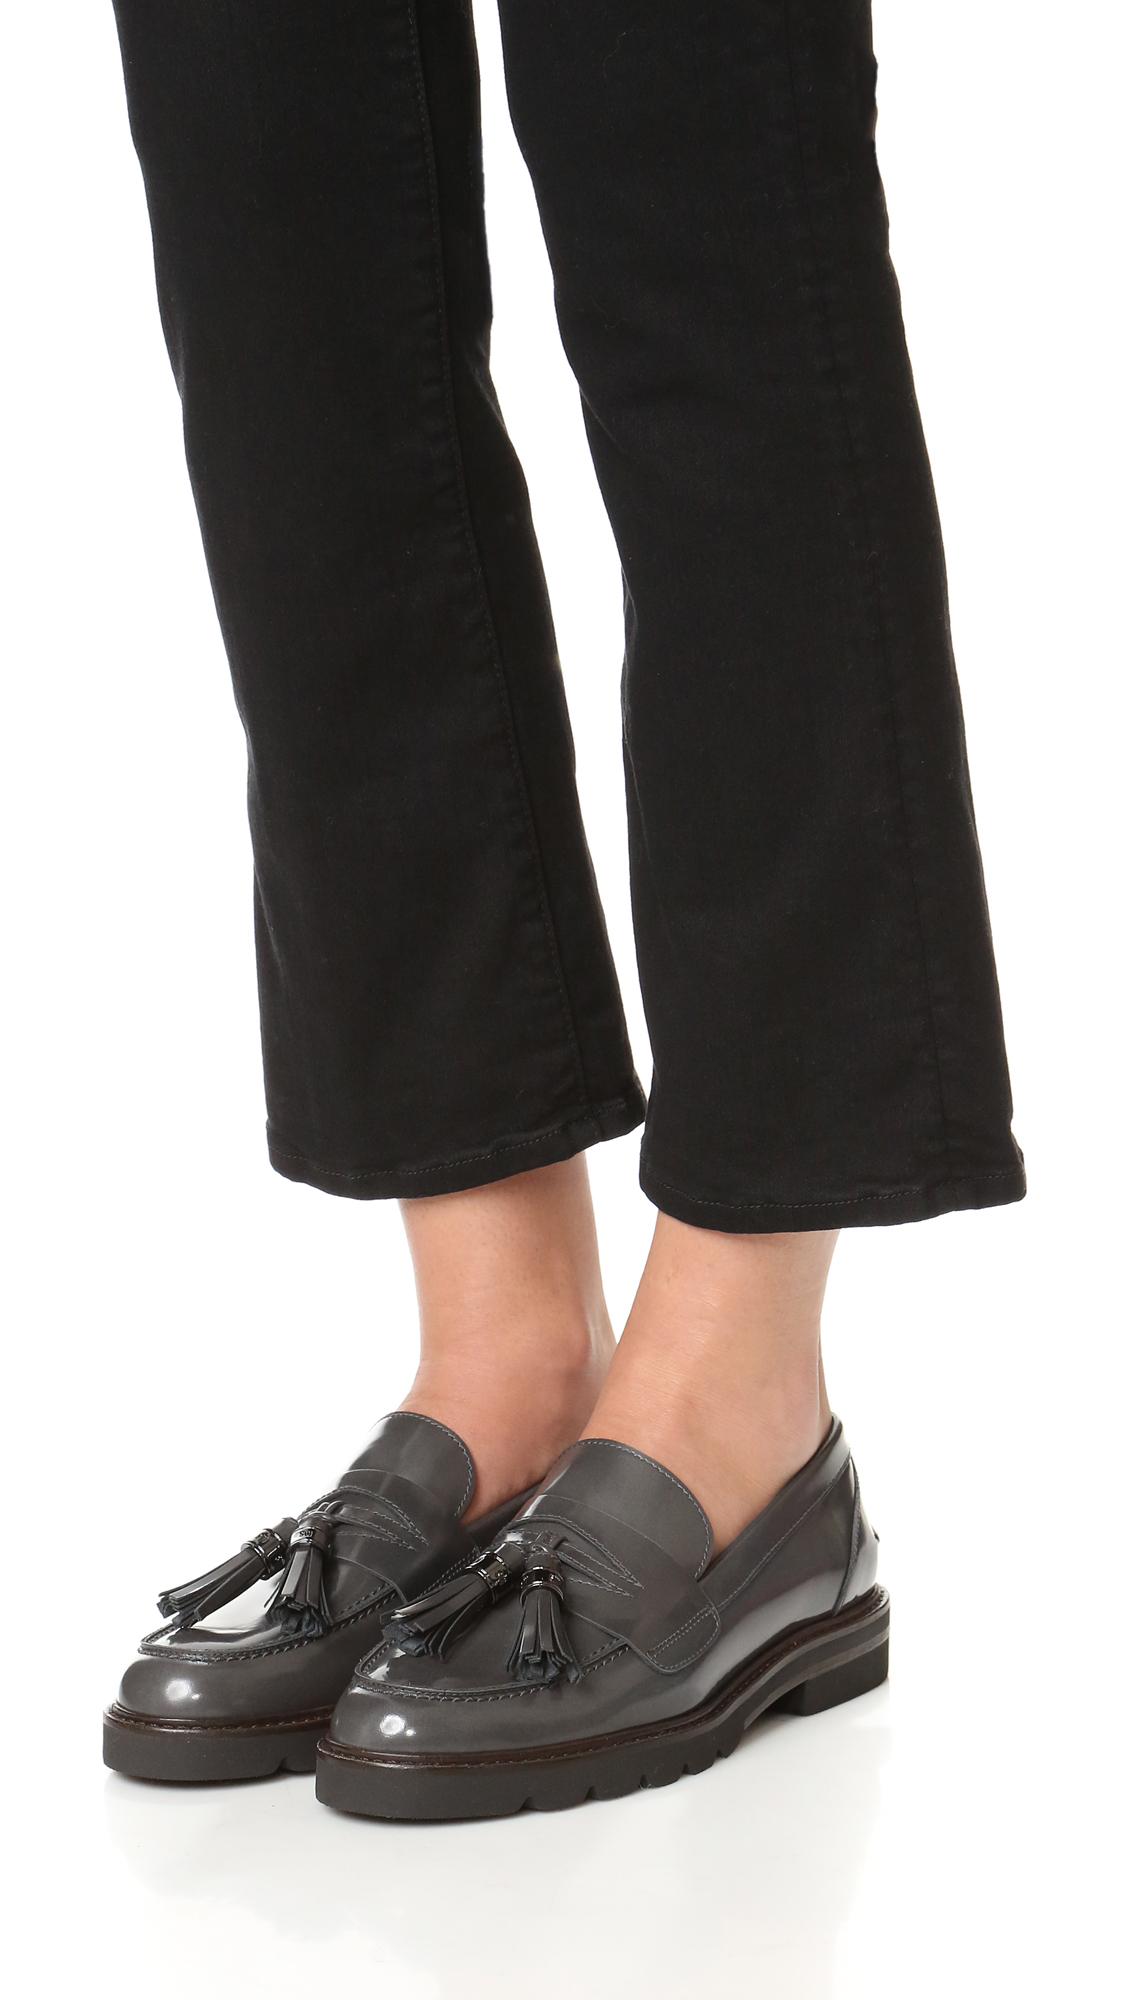 eastbay cheap online Stuart Weitzman Suede Platform Loafers discount 100% authentic 7SZvFUNx